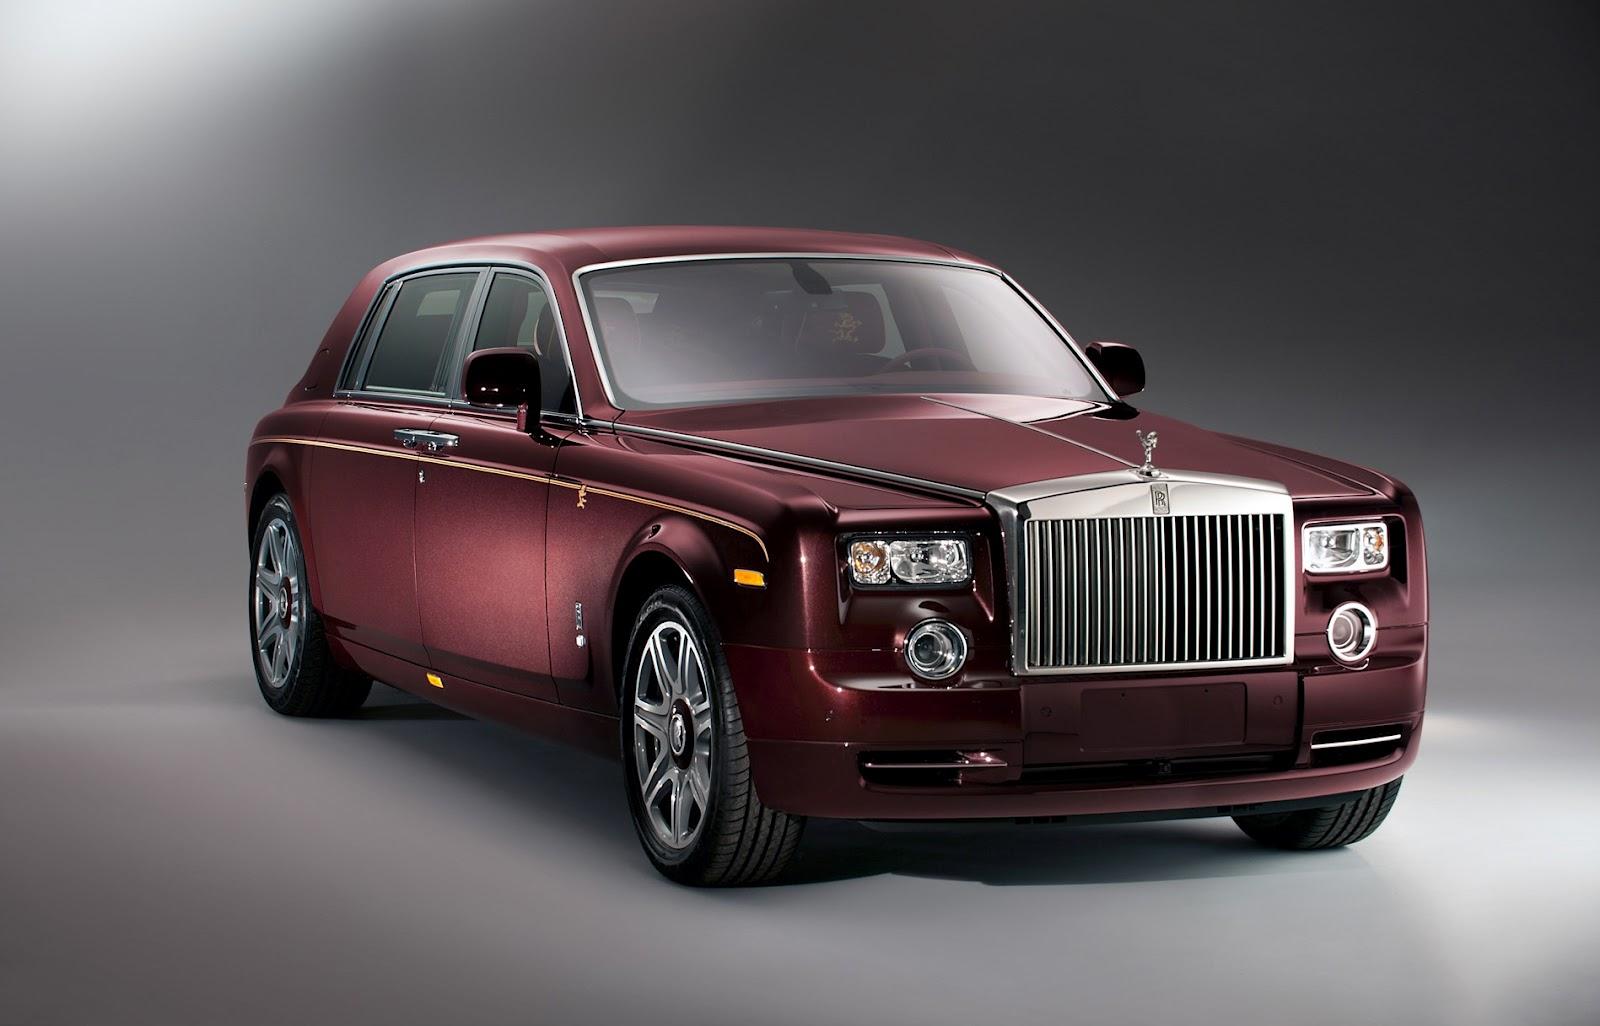 2012 rolls royce phantom year of the dragon colletion news hot car. Black Bedroom Furniture Sets. Home Design Ideas